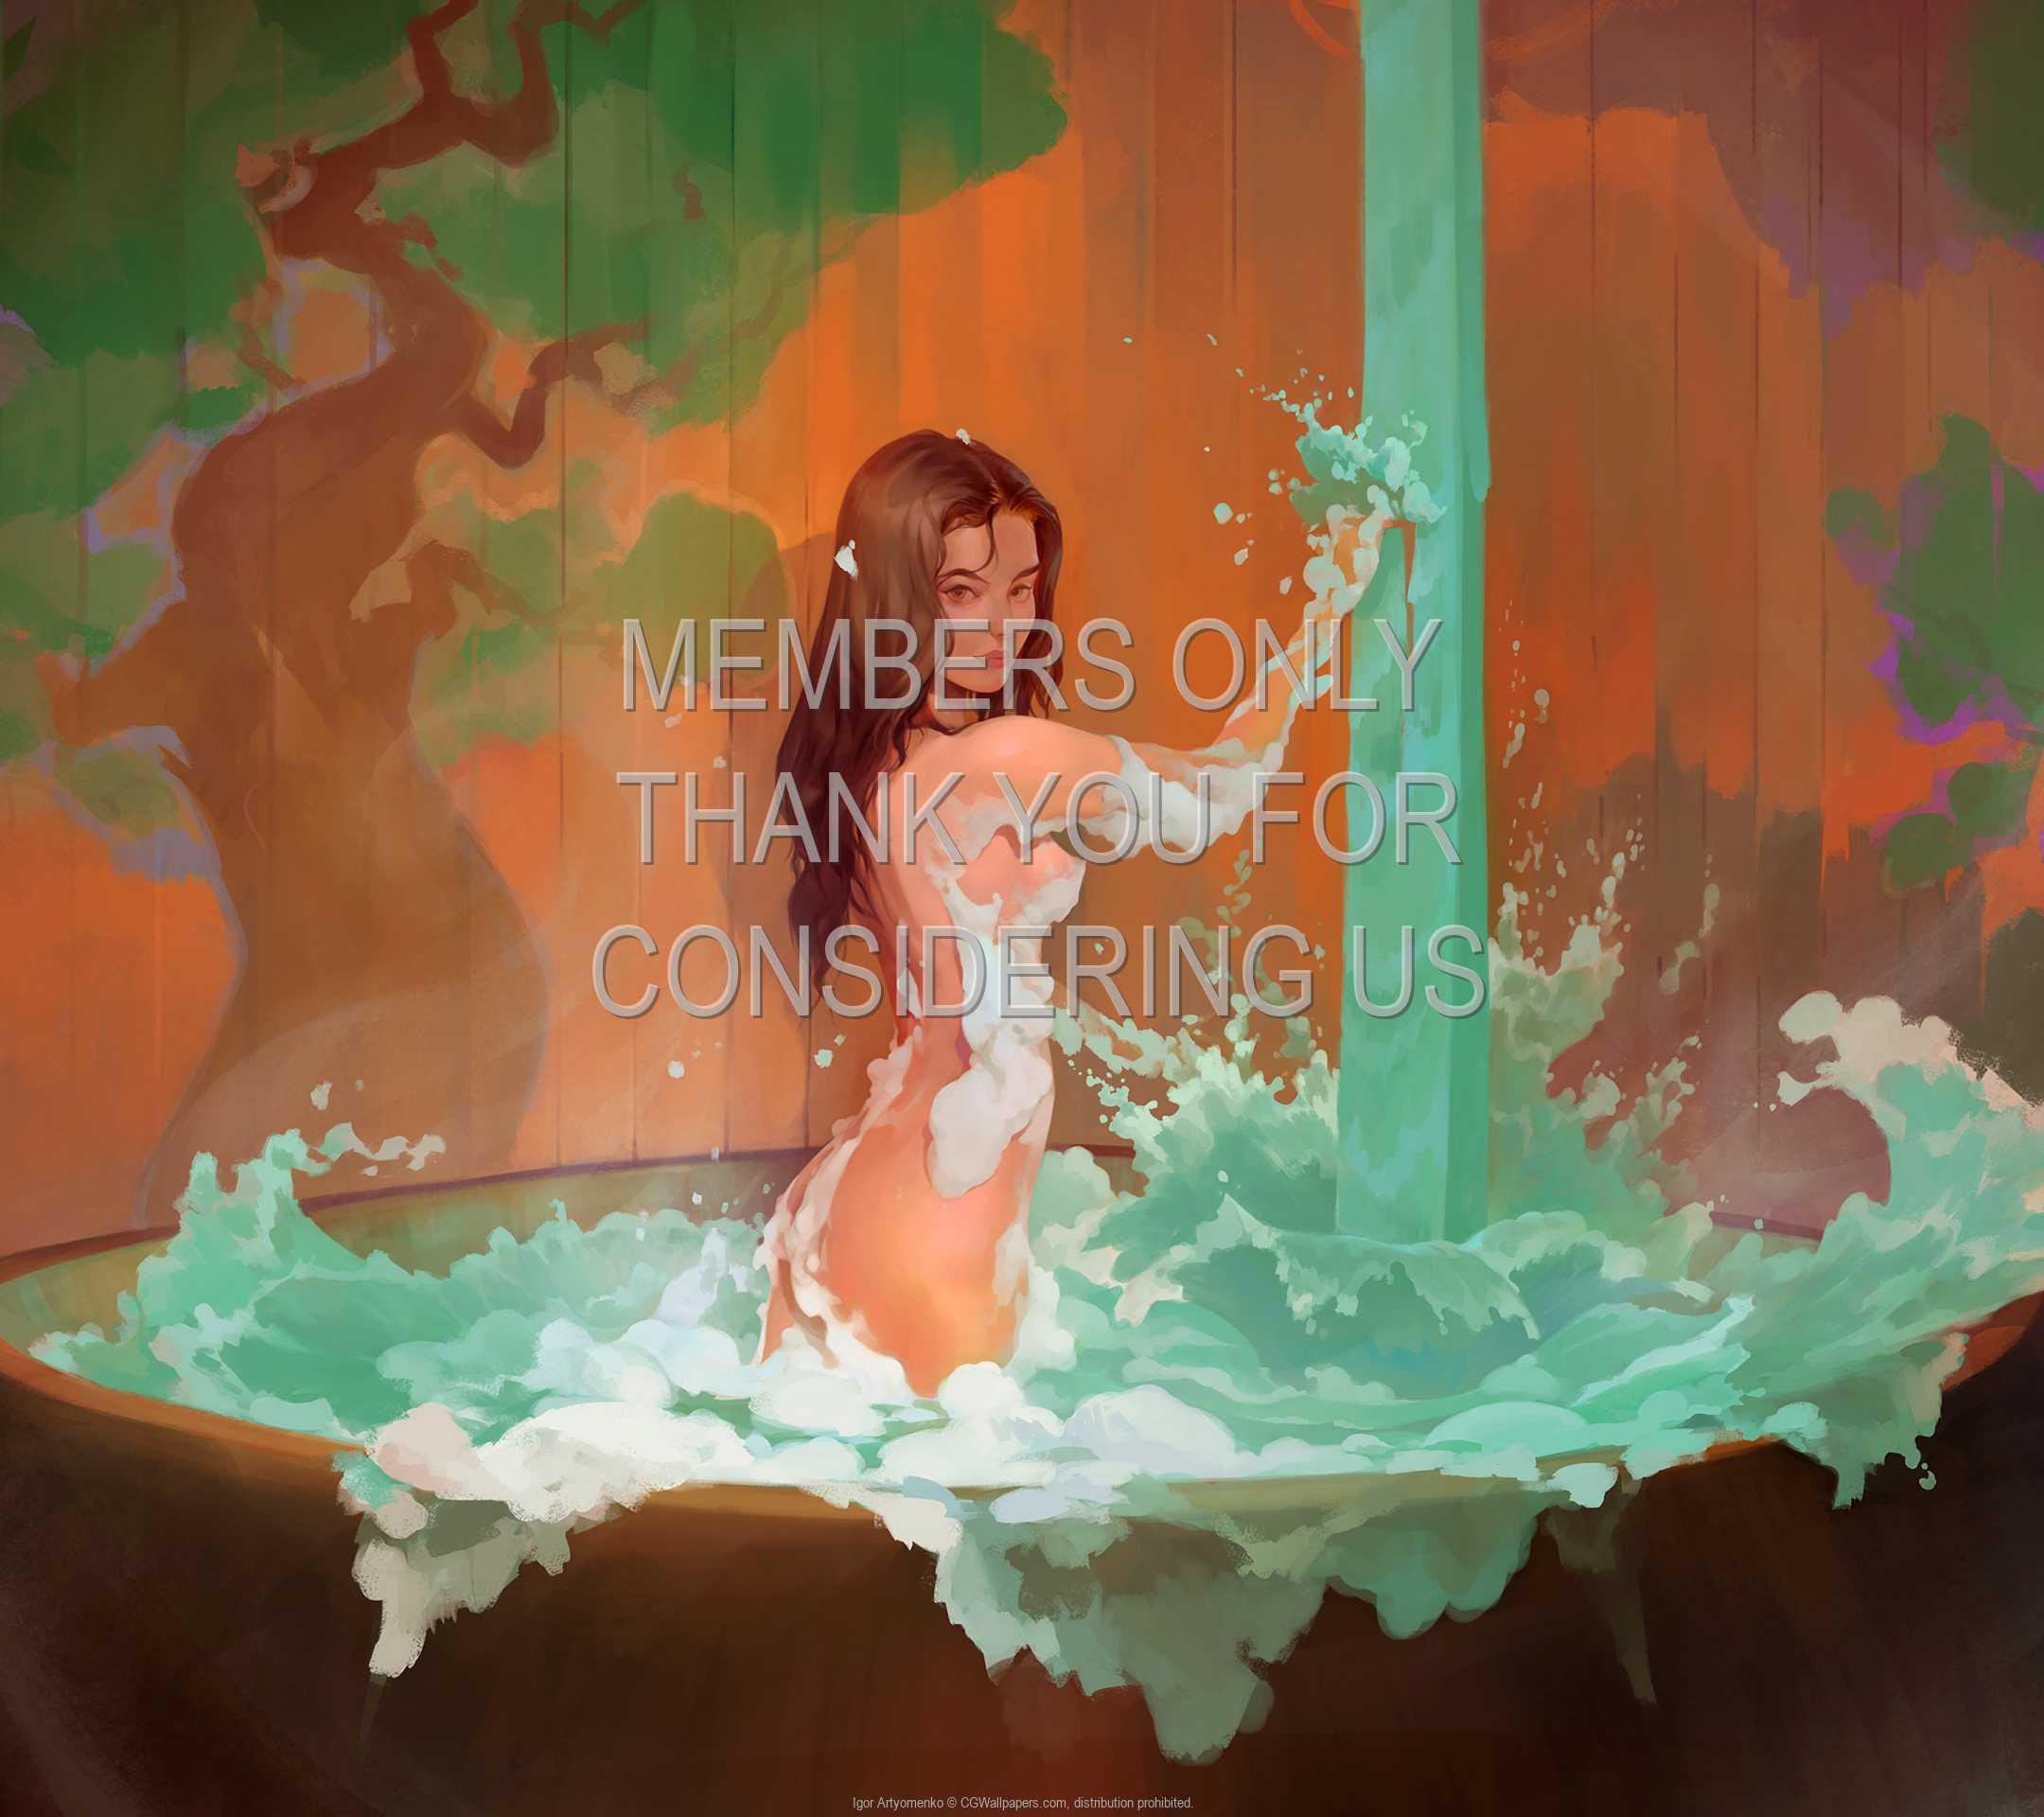 Igor Artyomenko 1080p Horizontal Mobile wallpaper or background 11